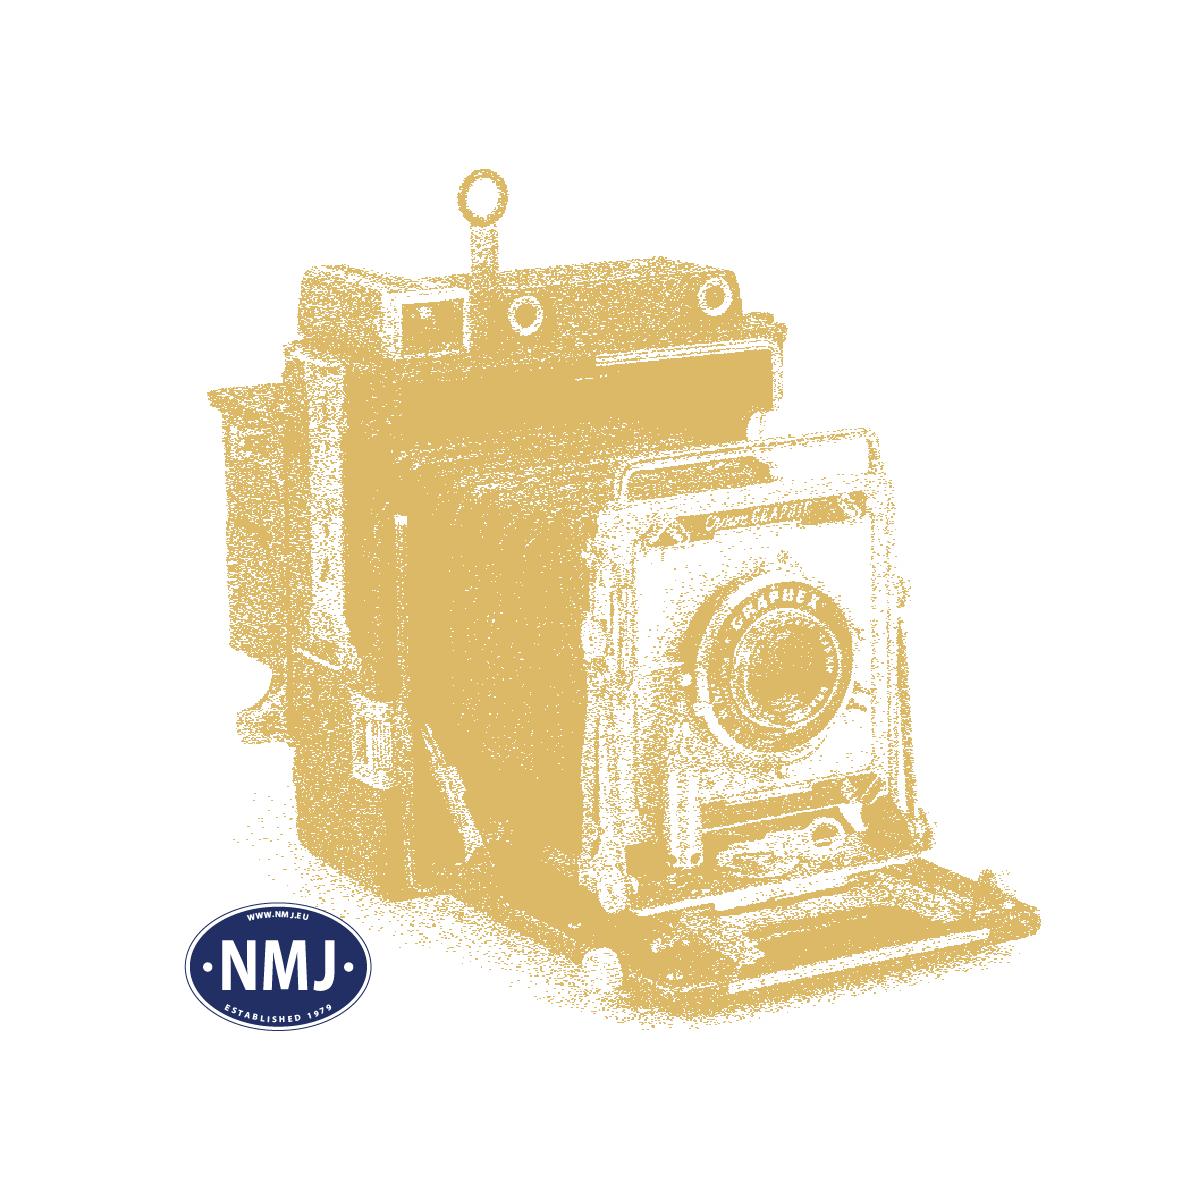 NMJT90012 - NMJ Topline NSB Di3a 619, Gammeldesign, DC